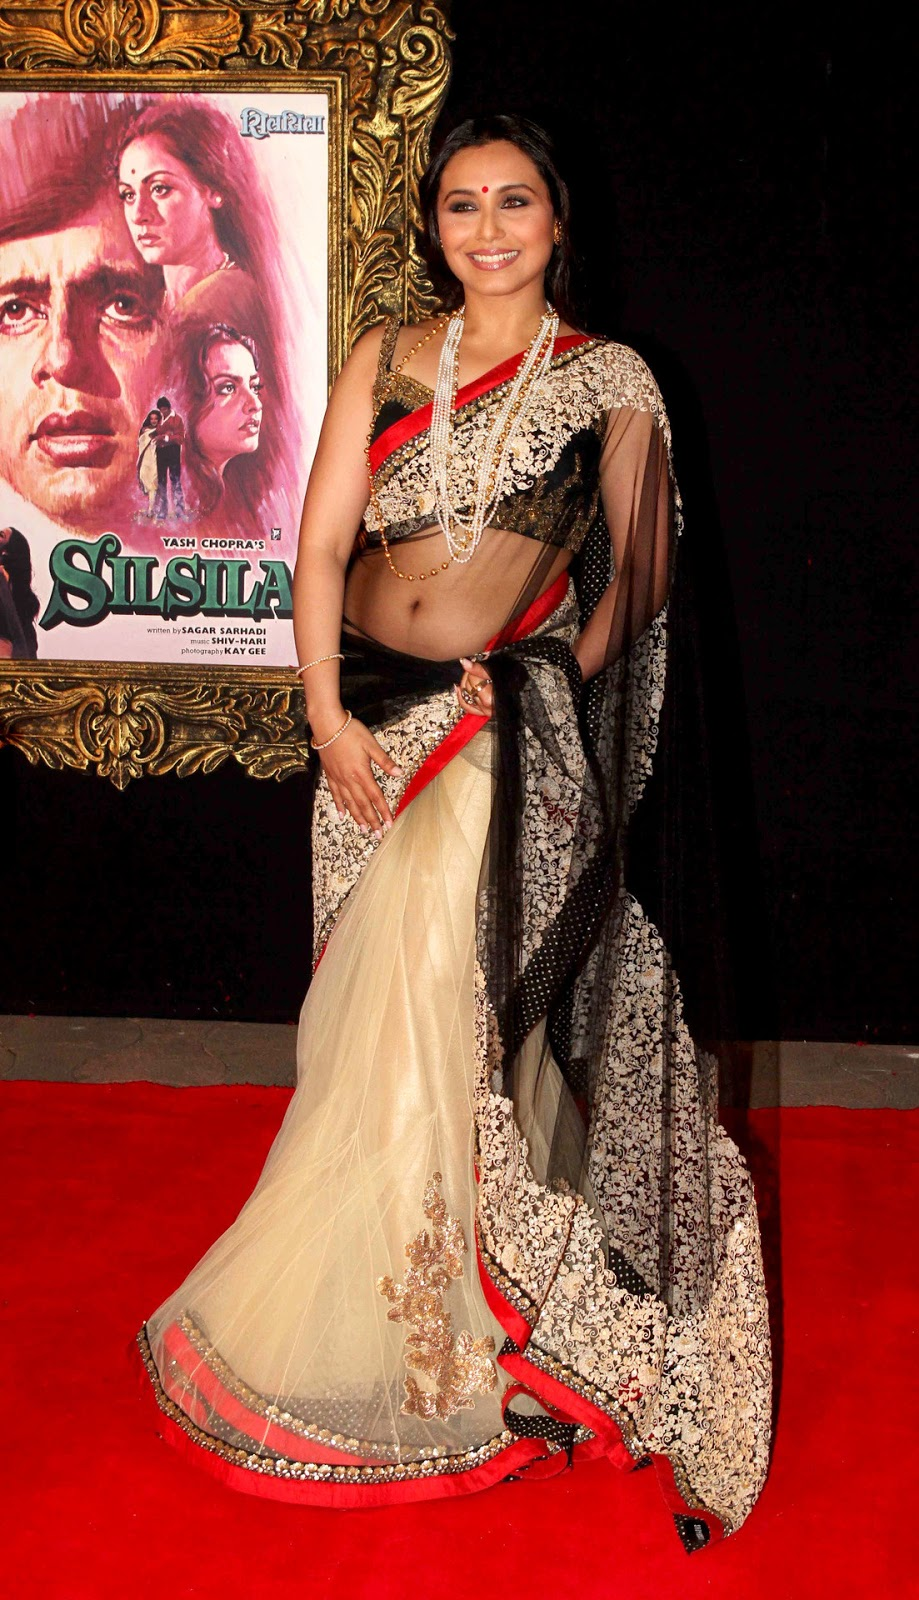 Rani Mukherjee Spicy in Saree Cute Pictures